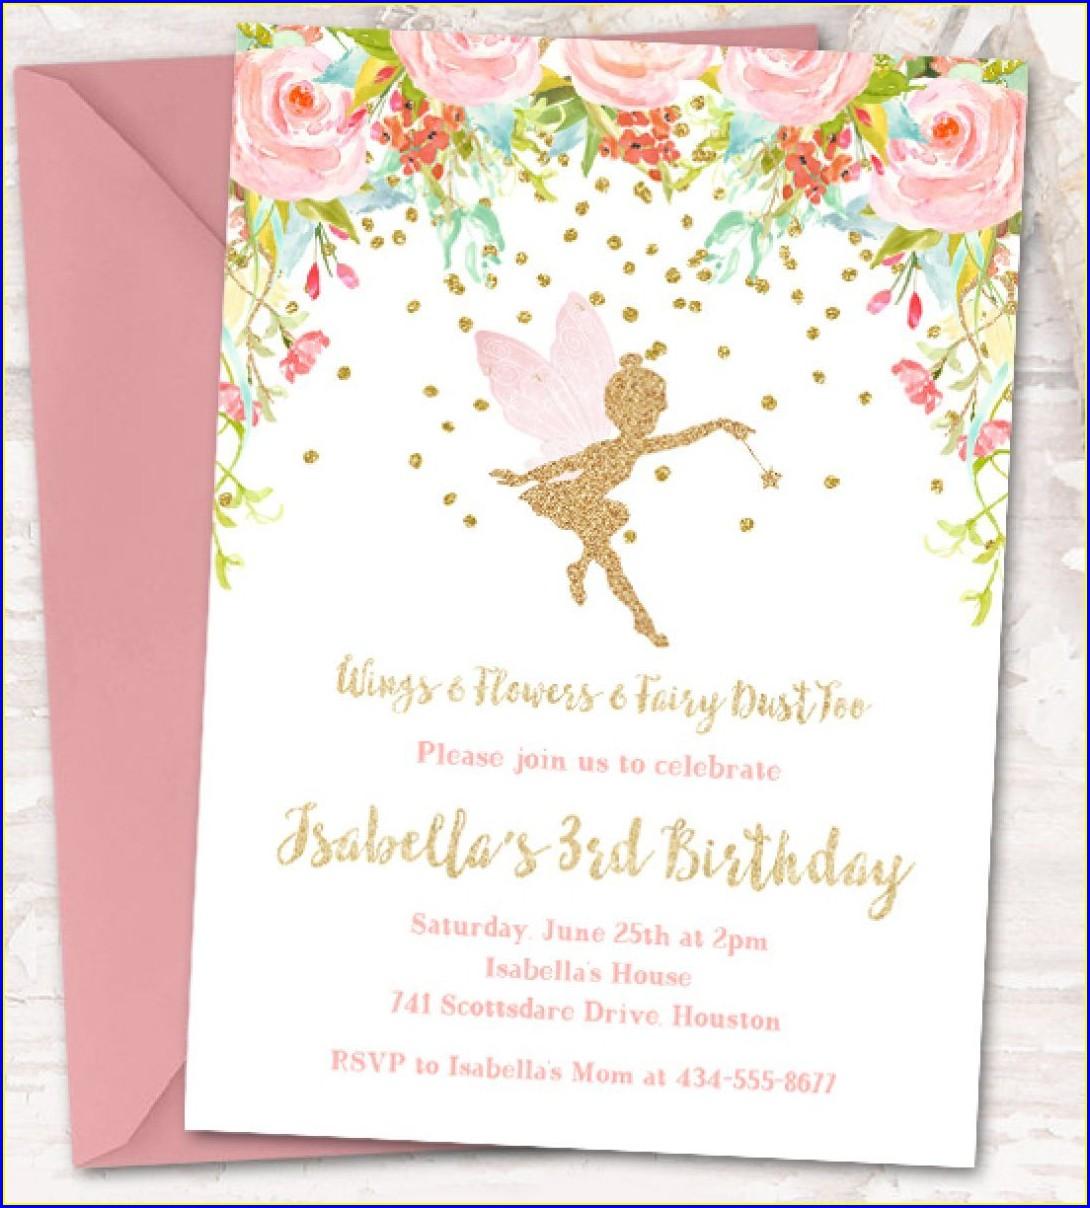 Editable 1st Birthday Invitation Card Template Free Download